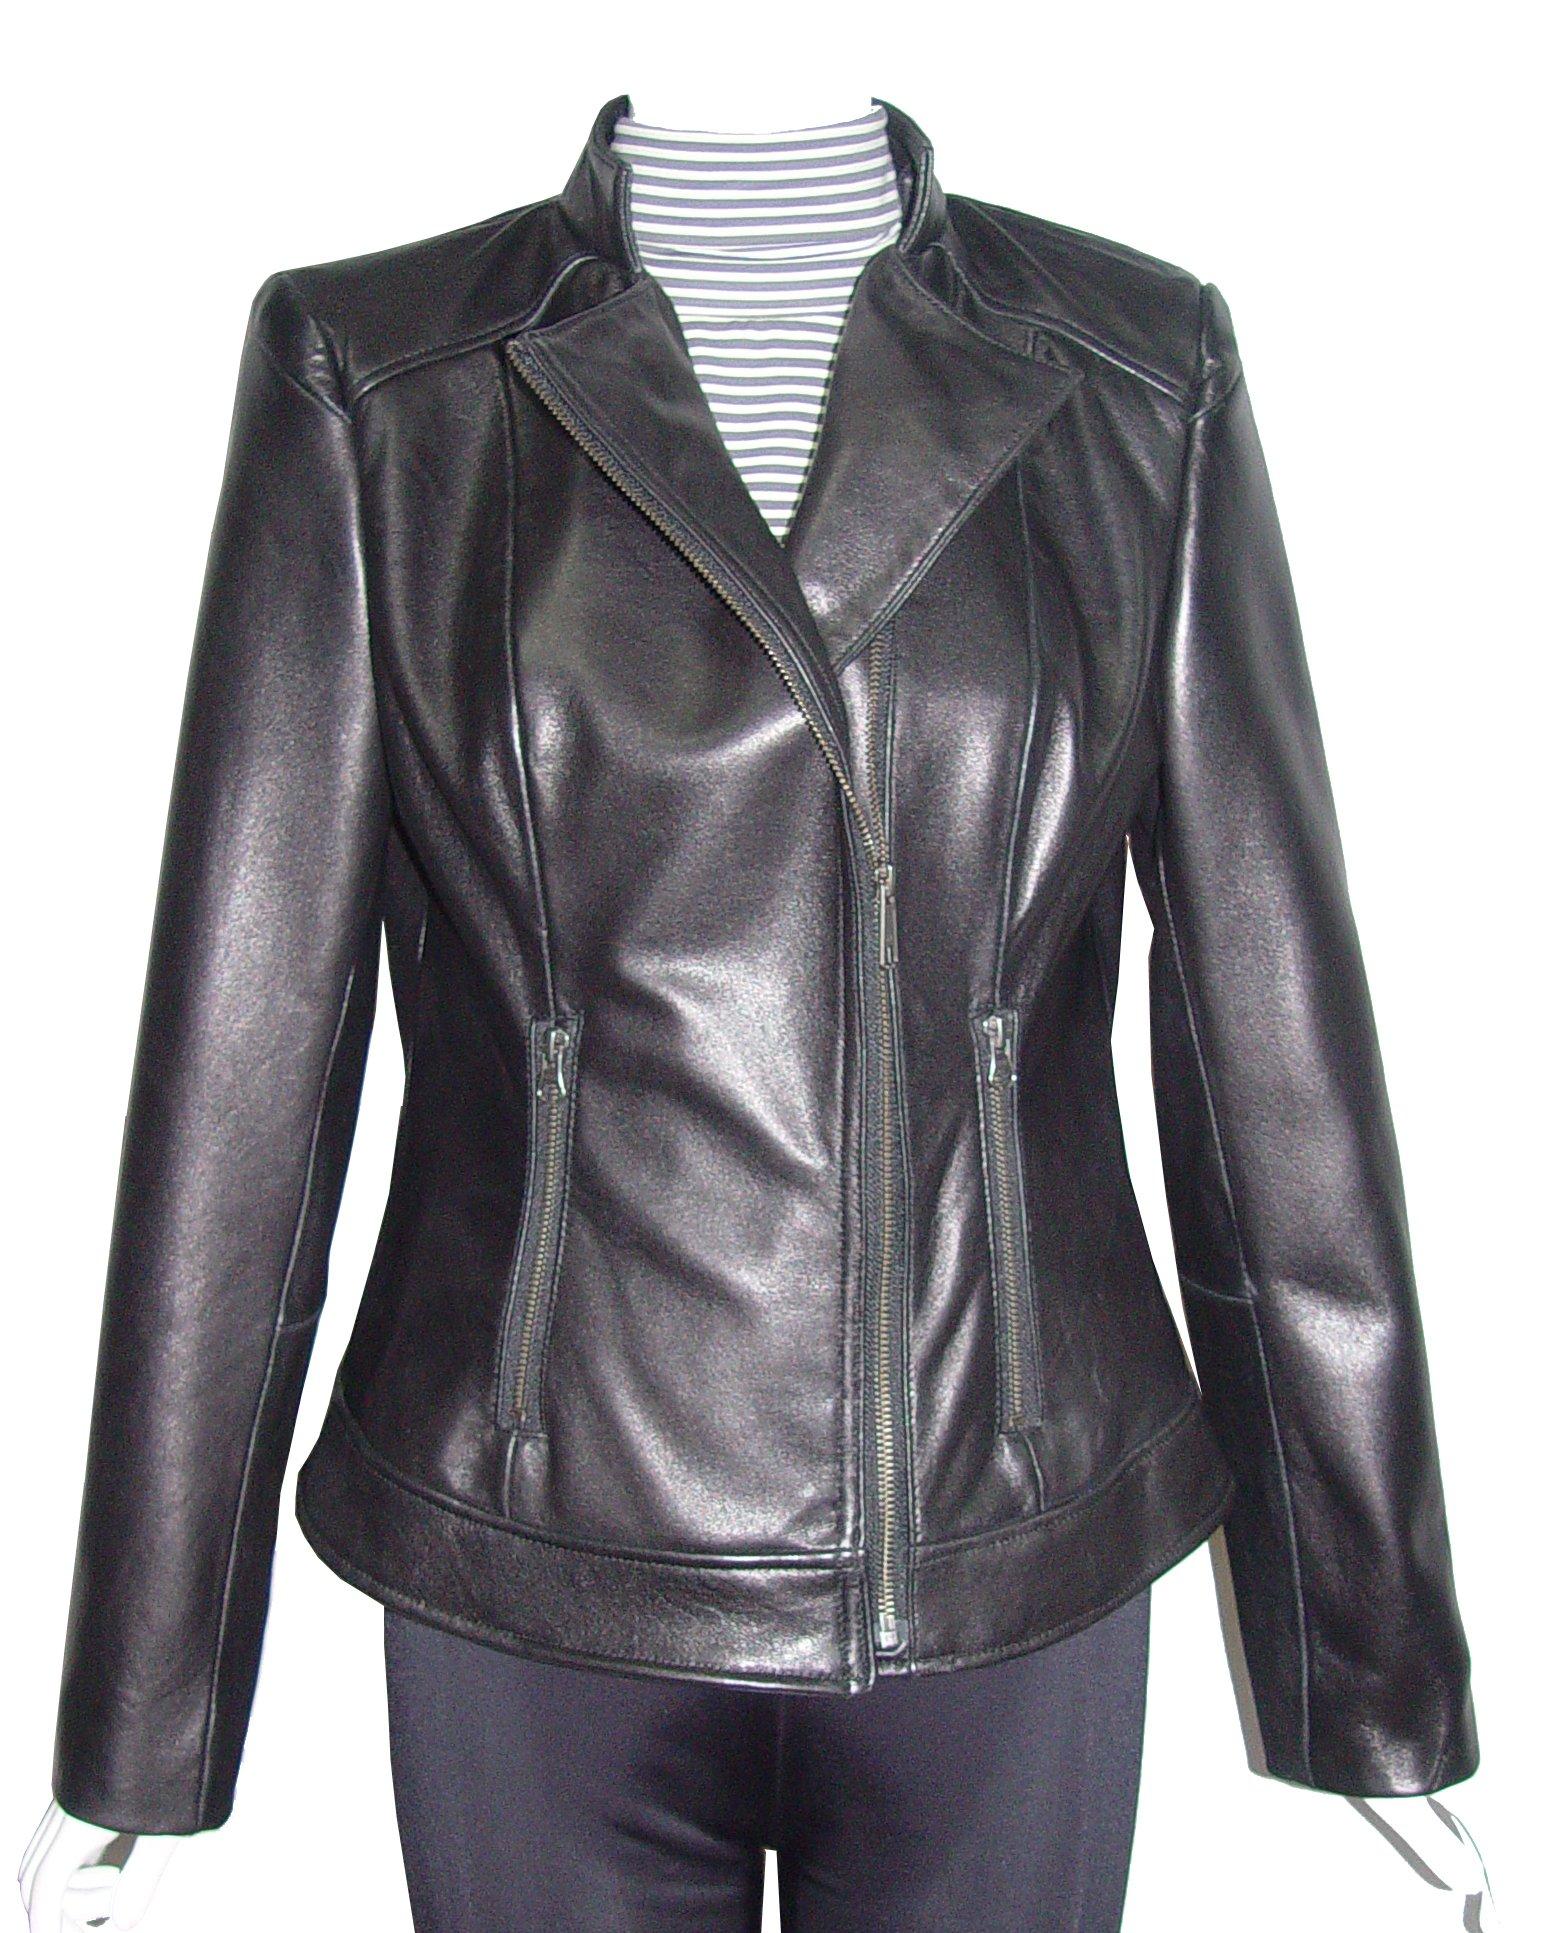 Nettailor 4064 Leather Clean Biker Jackets Womens Genuine Soft Lamb